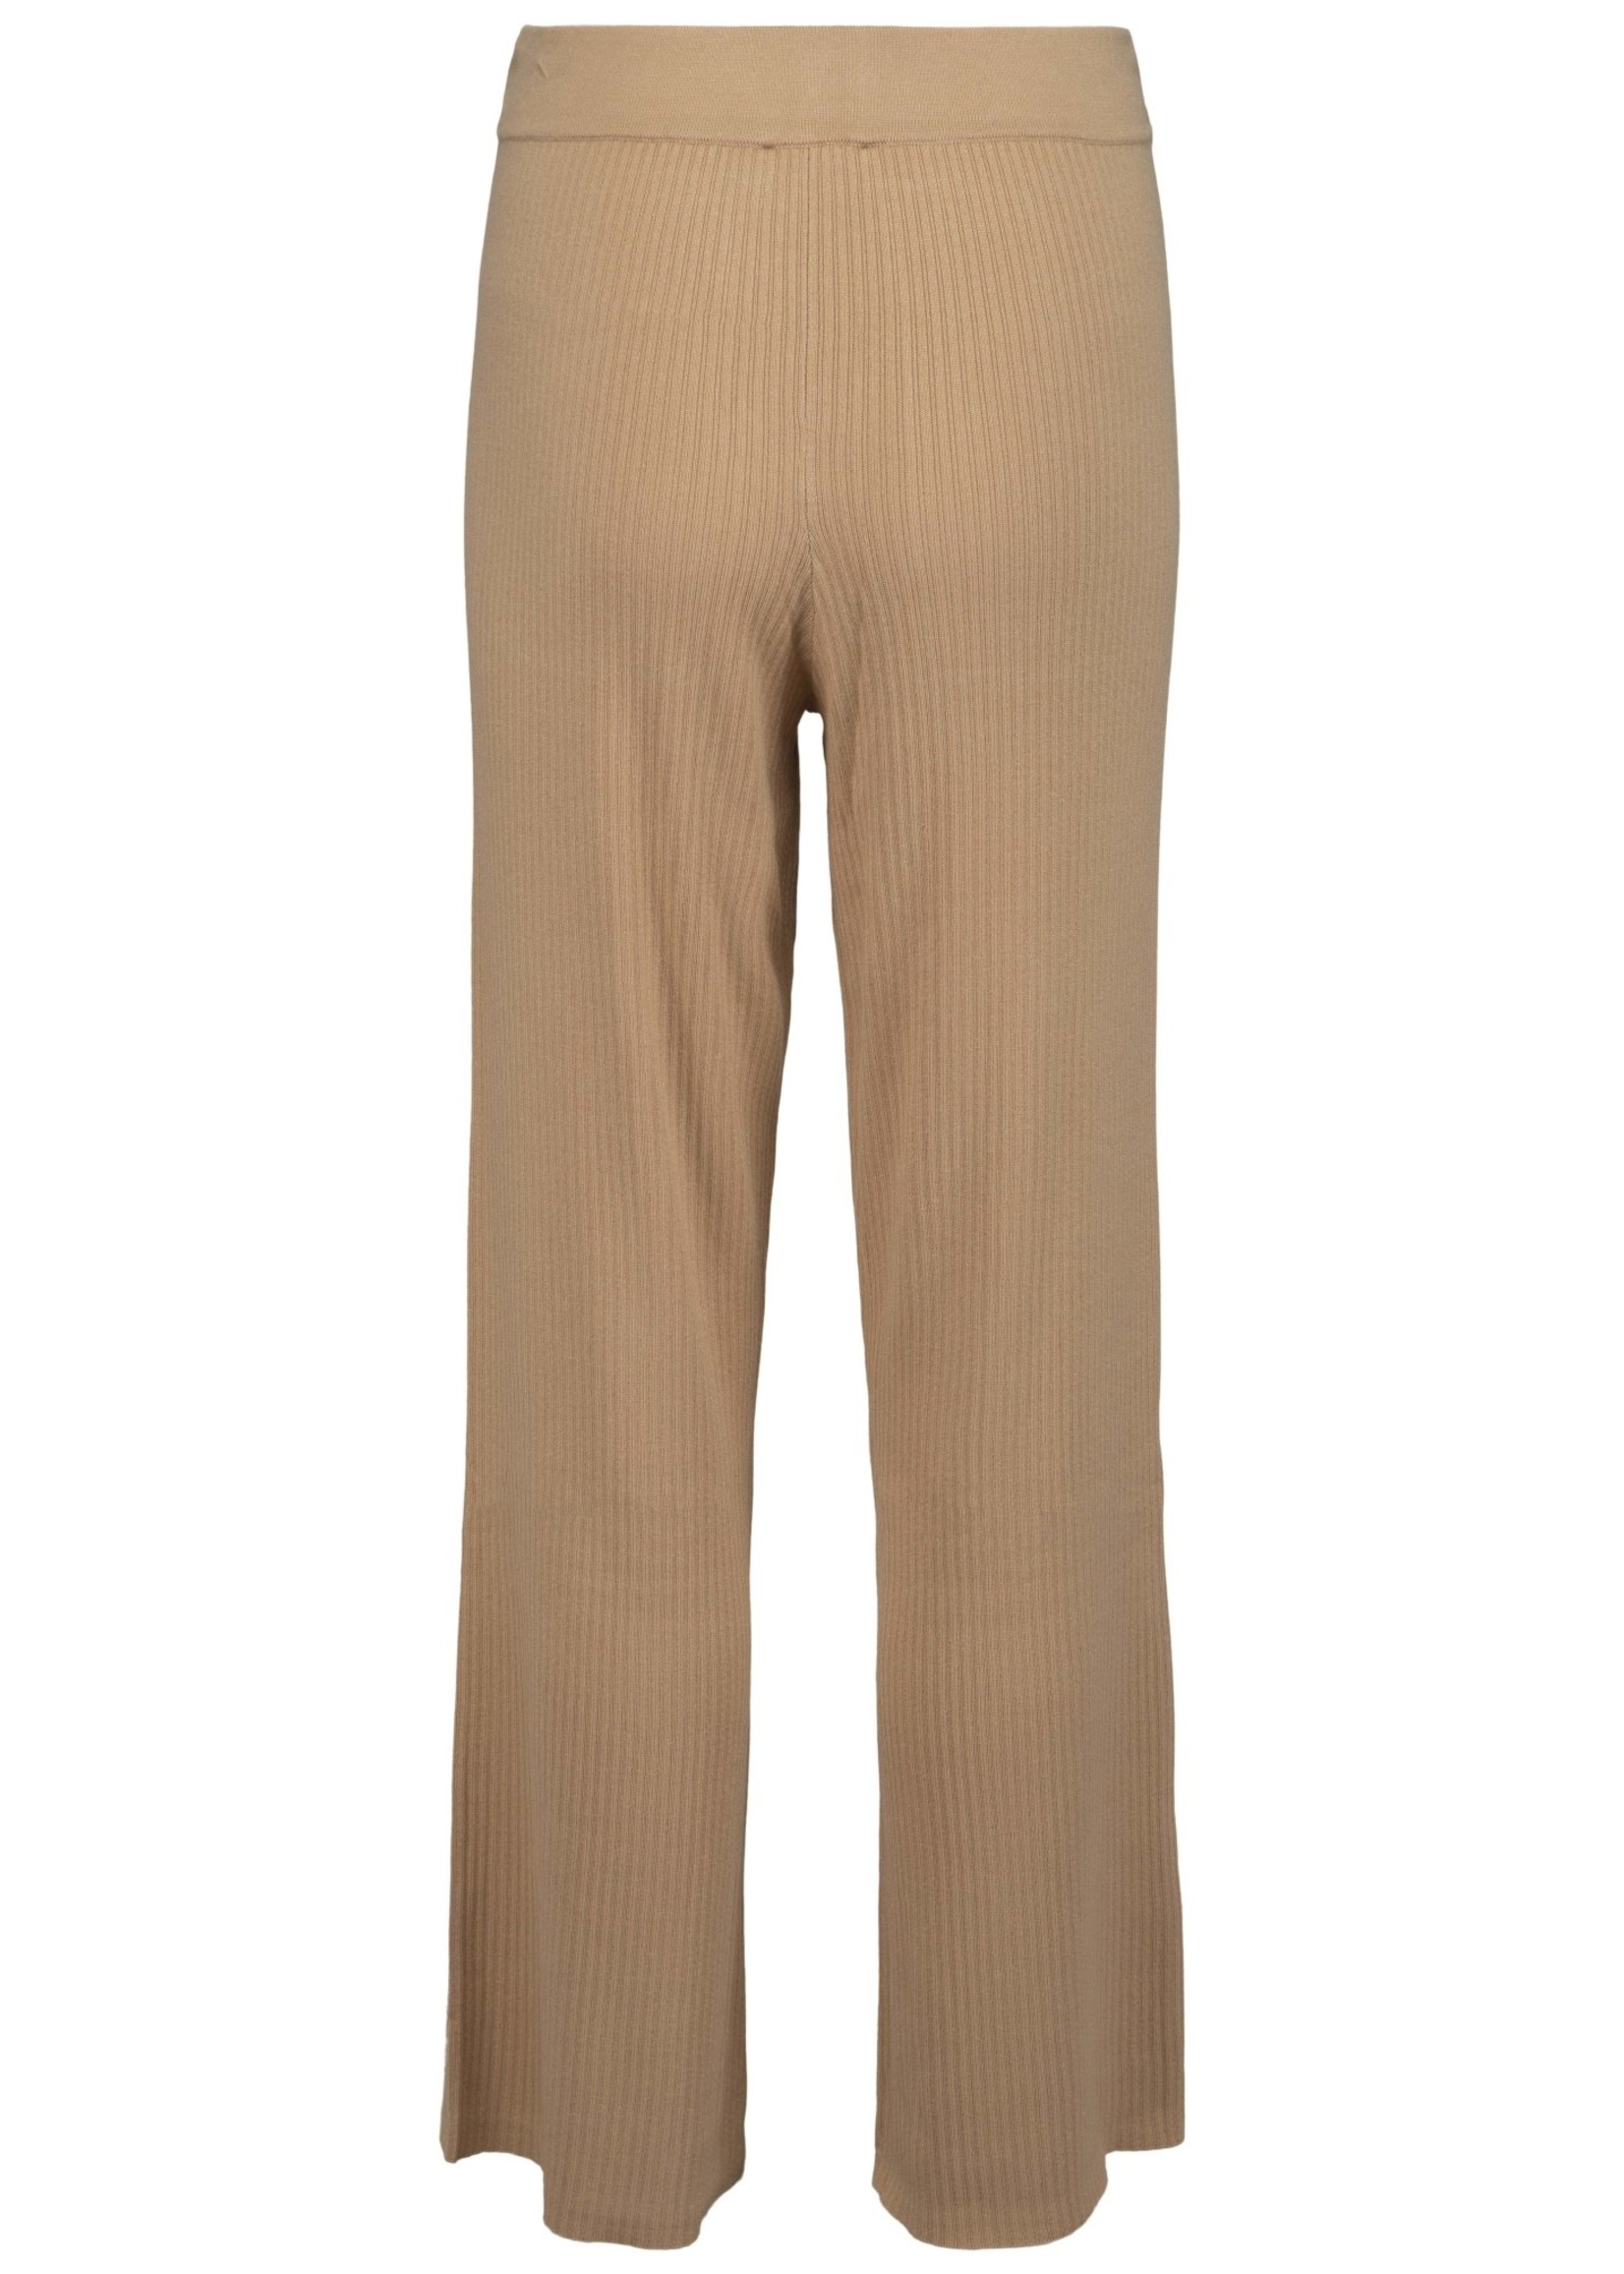 MINUS Tilia knit pants Almond melange